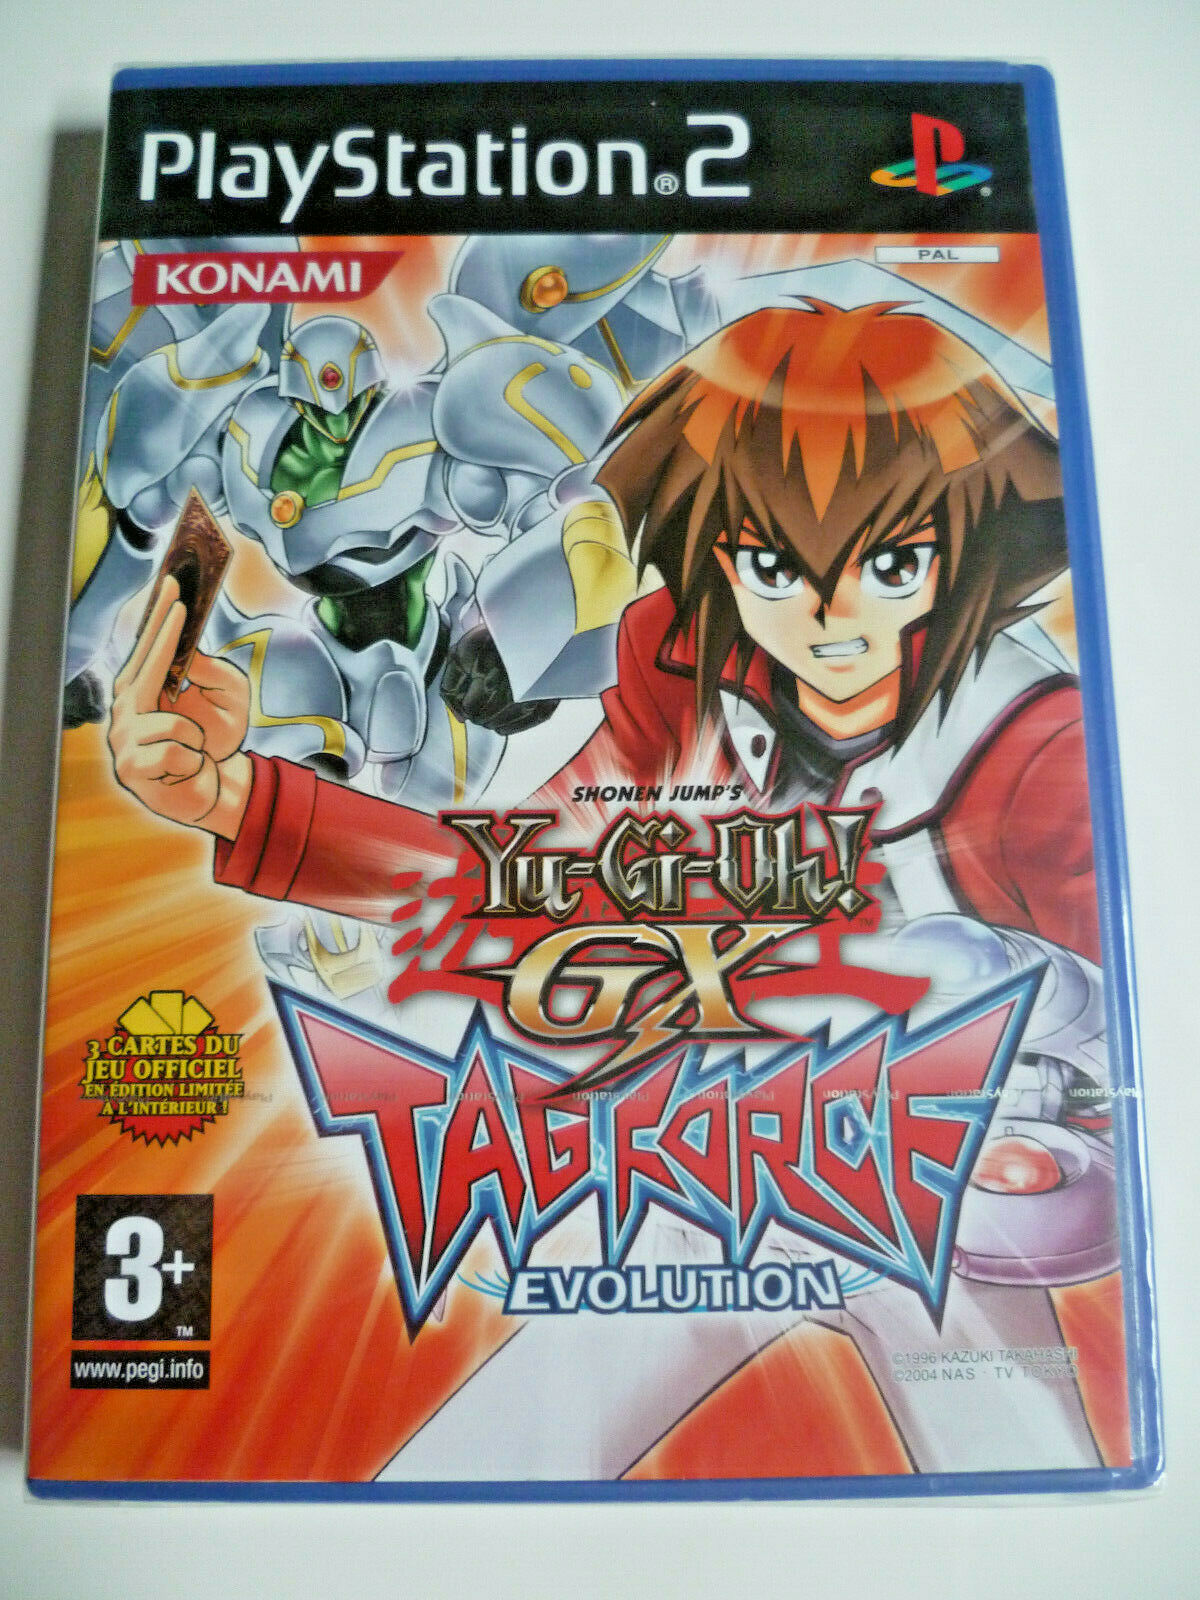 Yu-gi-oh  gx tag force evolution ps2 playstation 2 new FR version rare